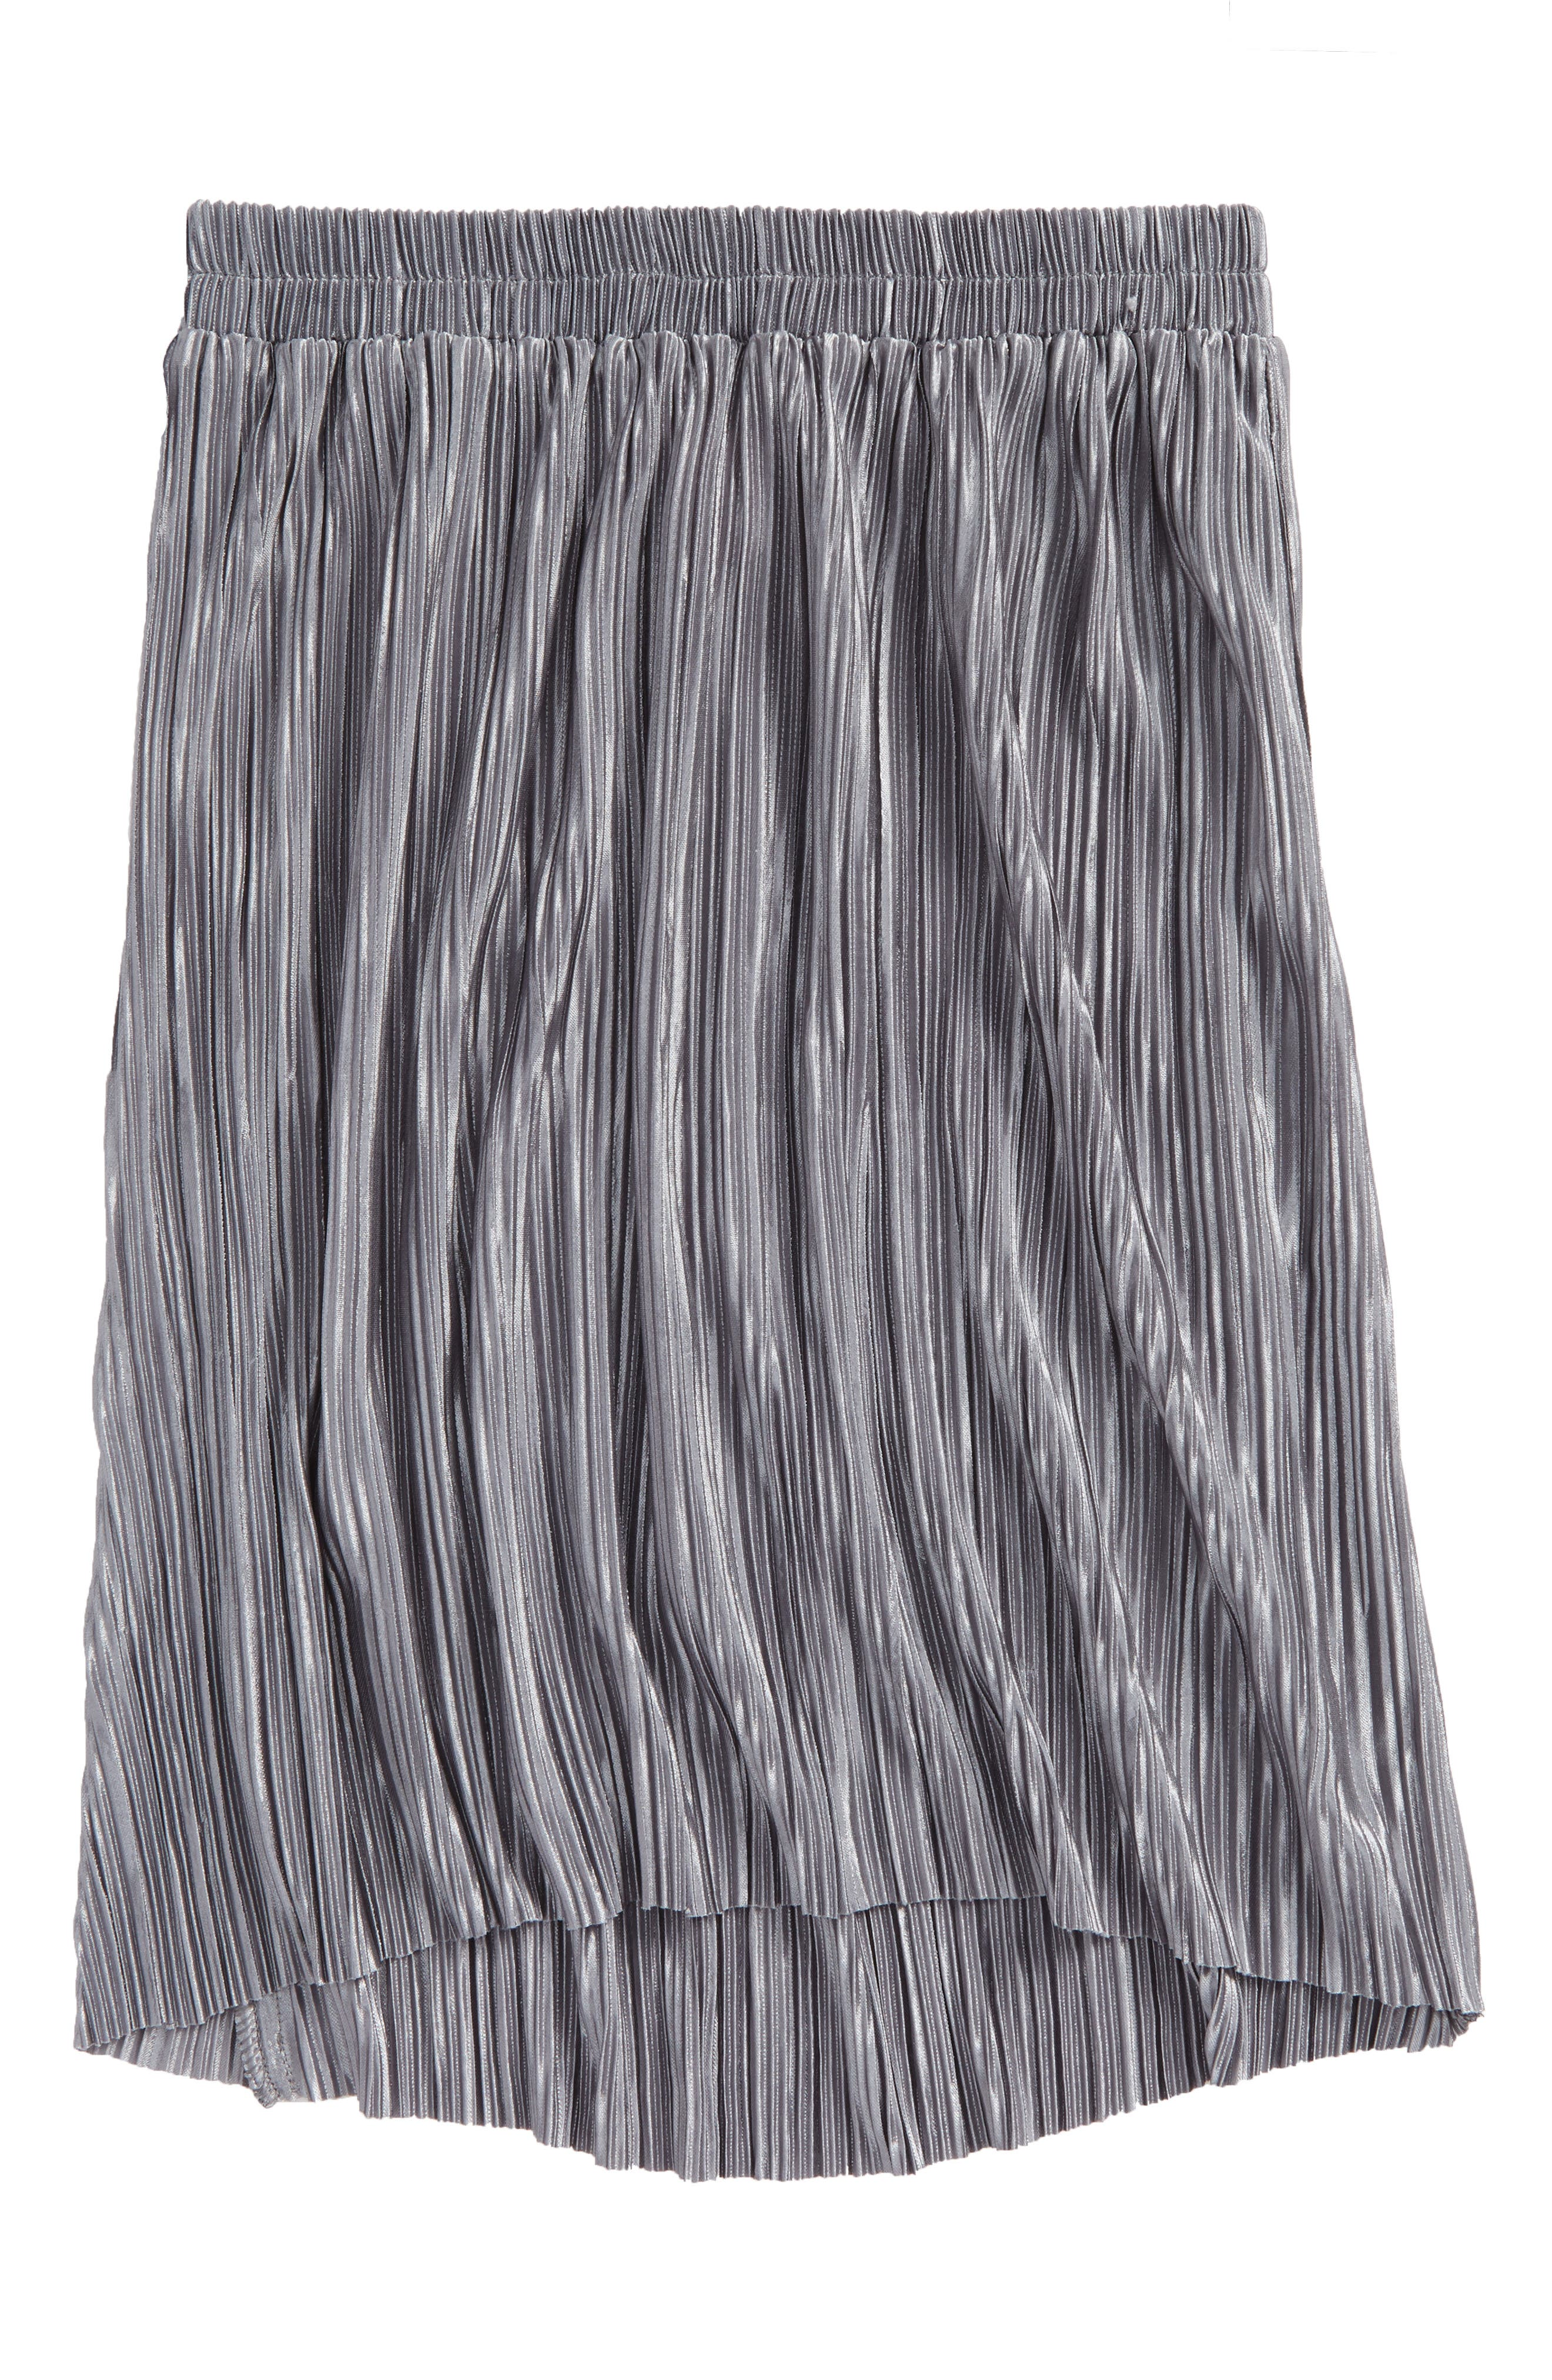 Pleated Metallic Skirt,                             Main thumbnail 1, color,                             Silver